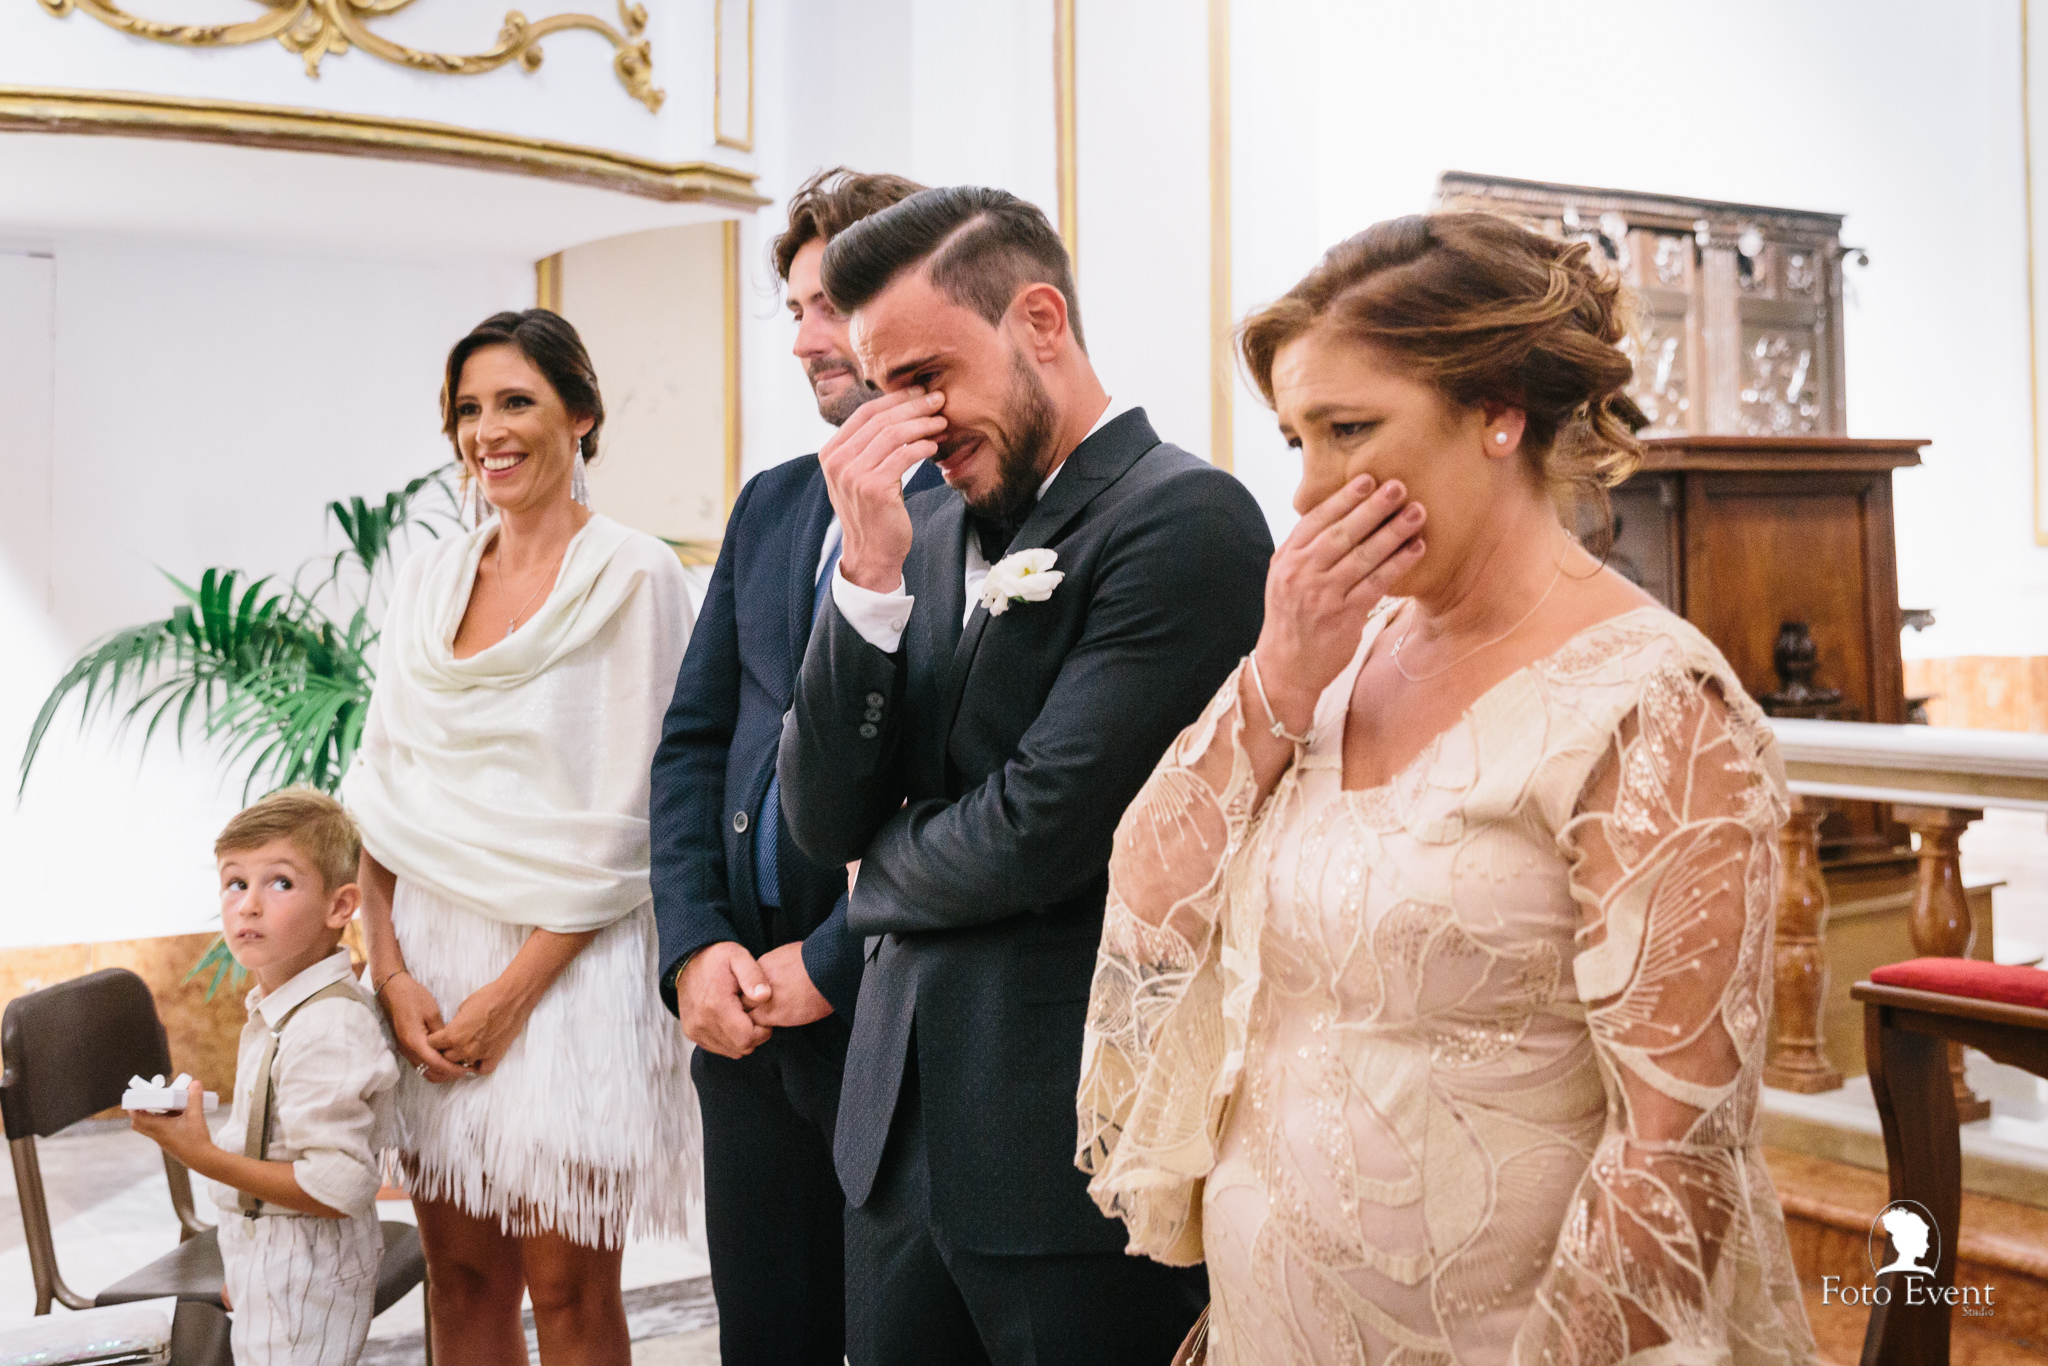 032-2019-08-31-Matrimonio-Serena-e-Saverio-Tarantino-5DE-1085